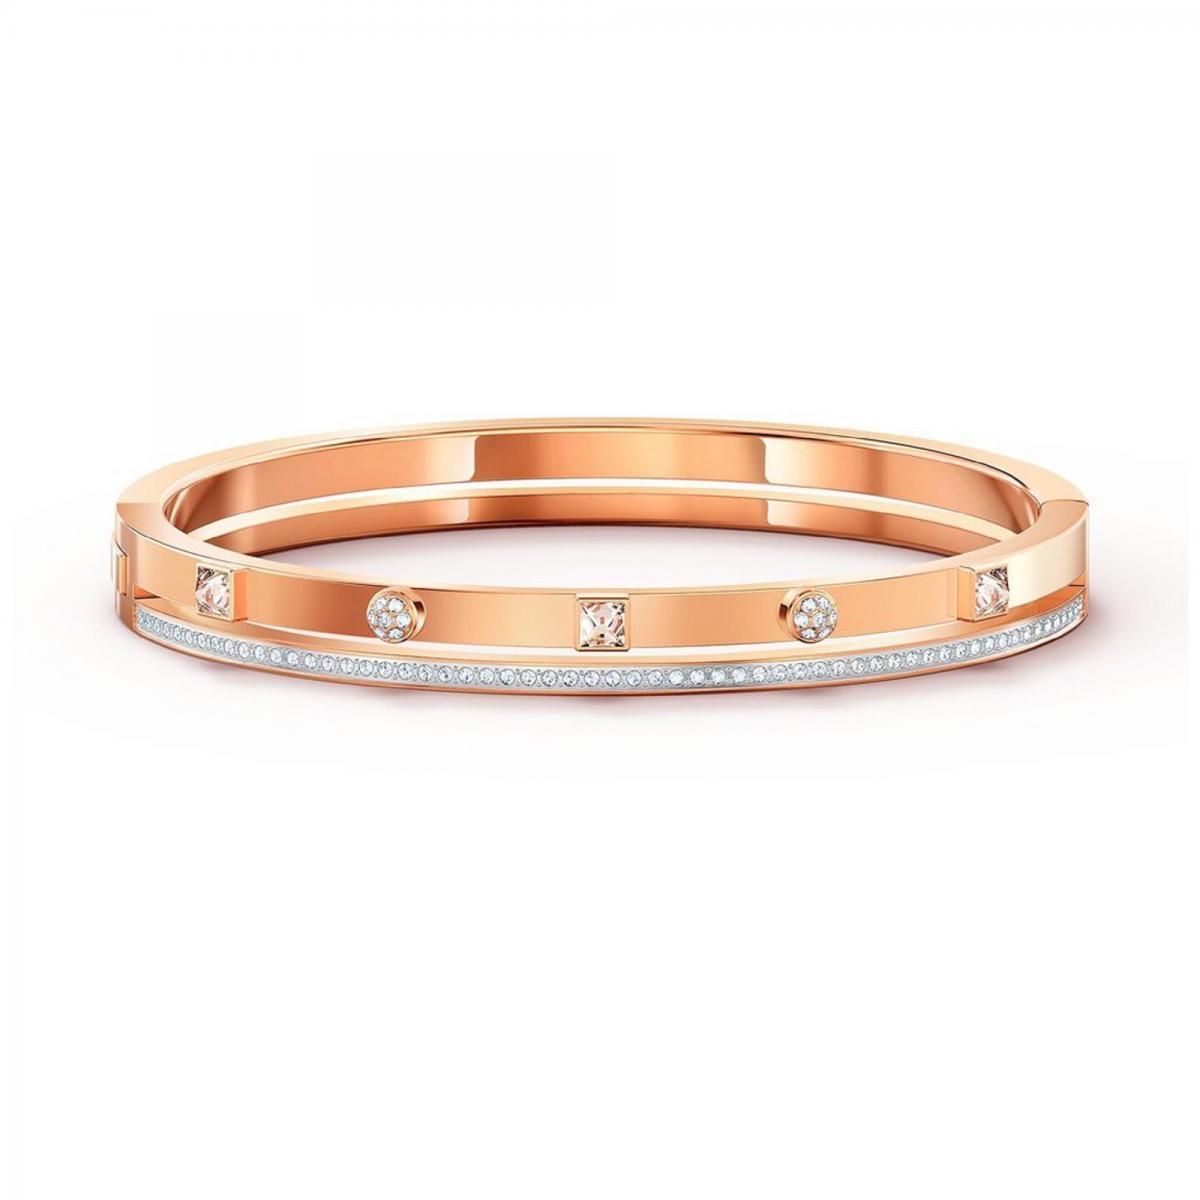 BRACELET Swarovski 5572914 - Bracelet Femme